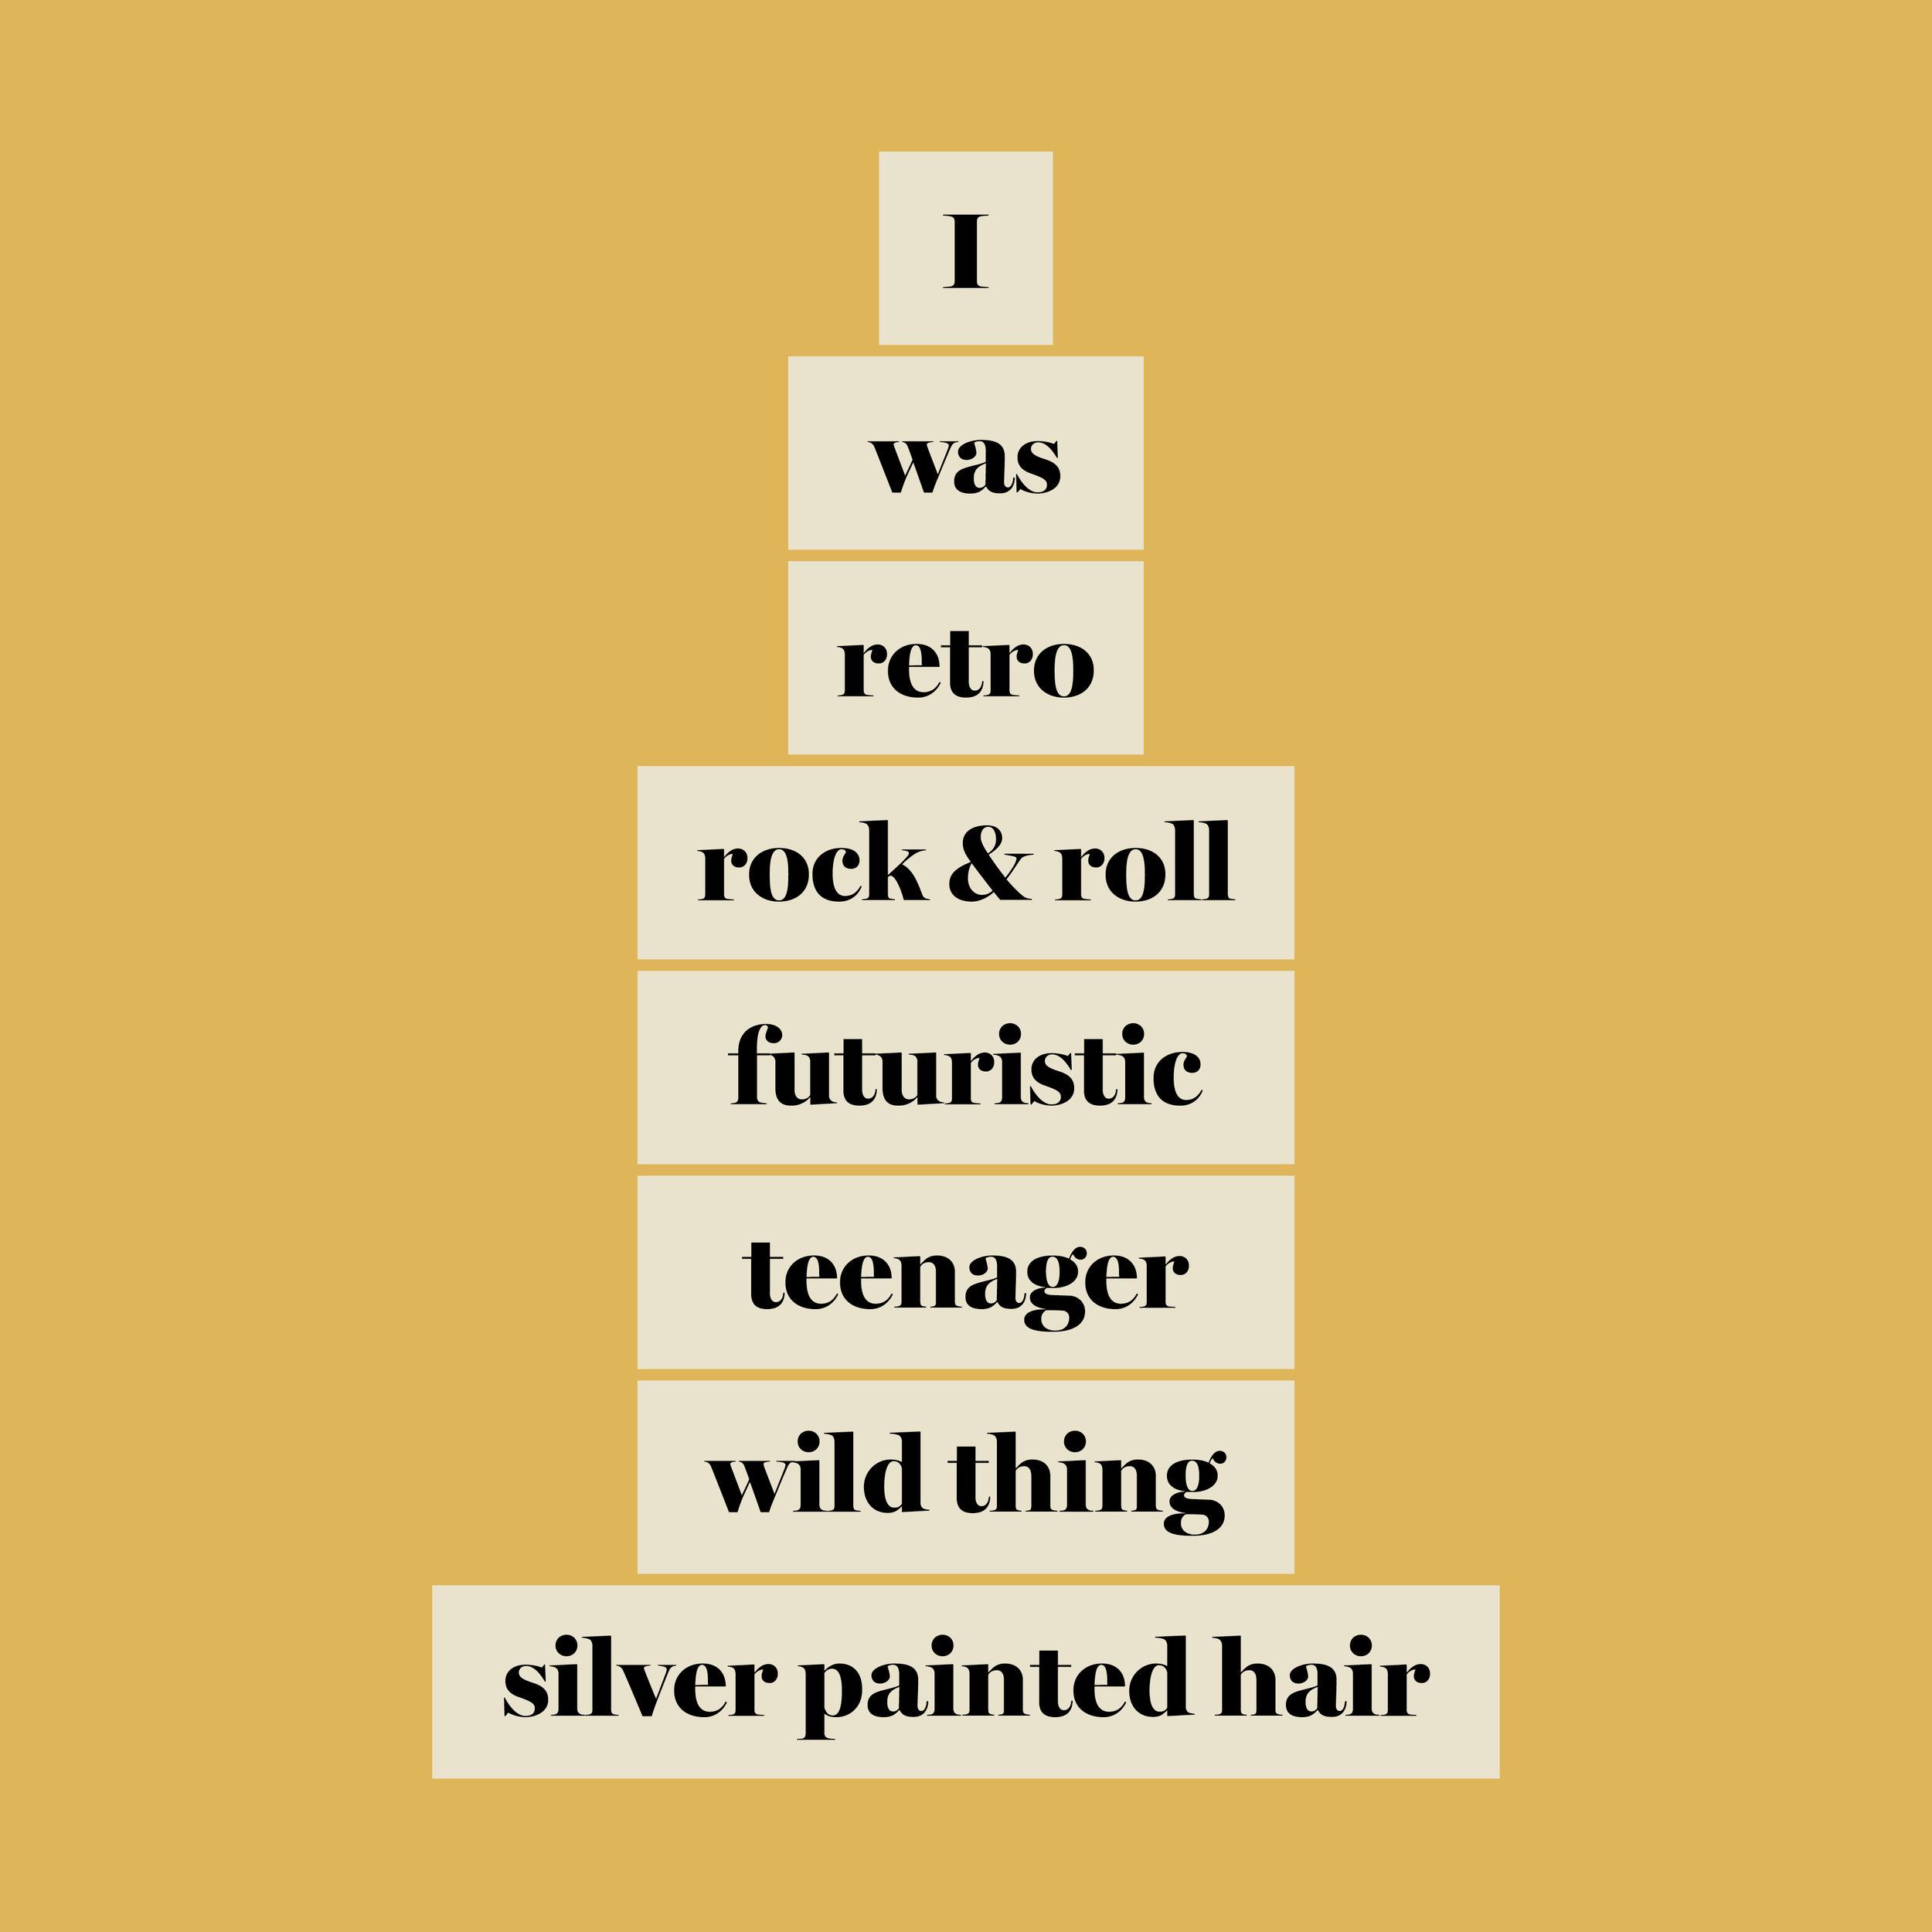 We Were Here, I was retro